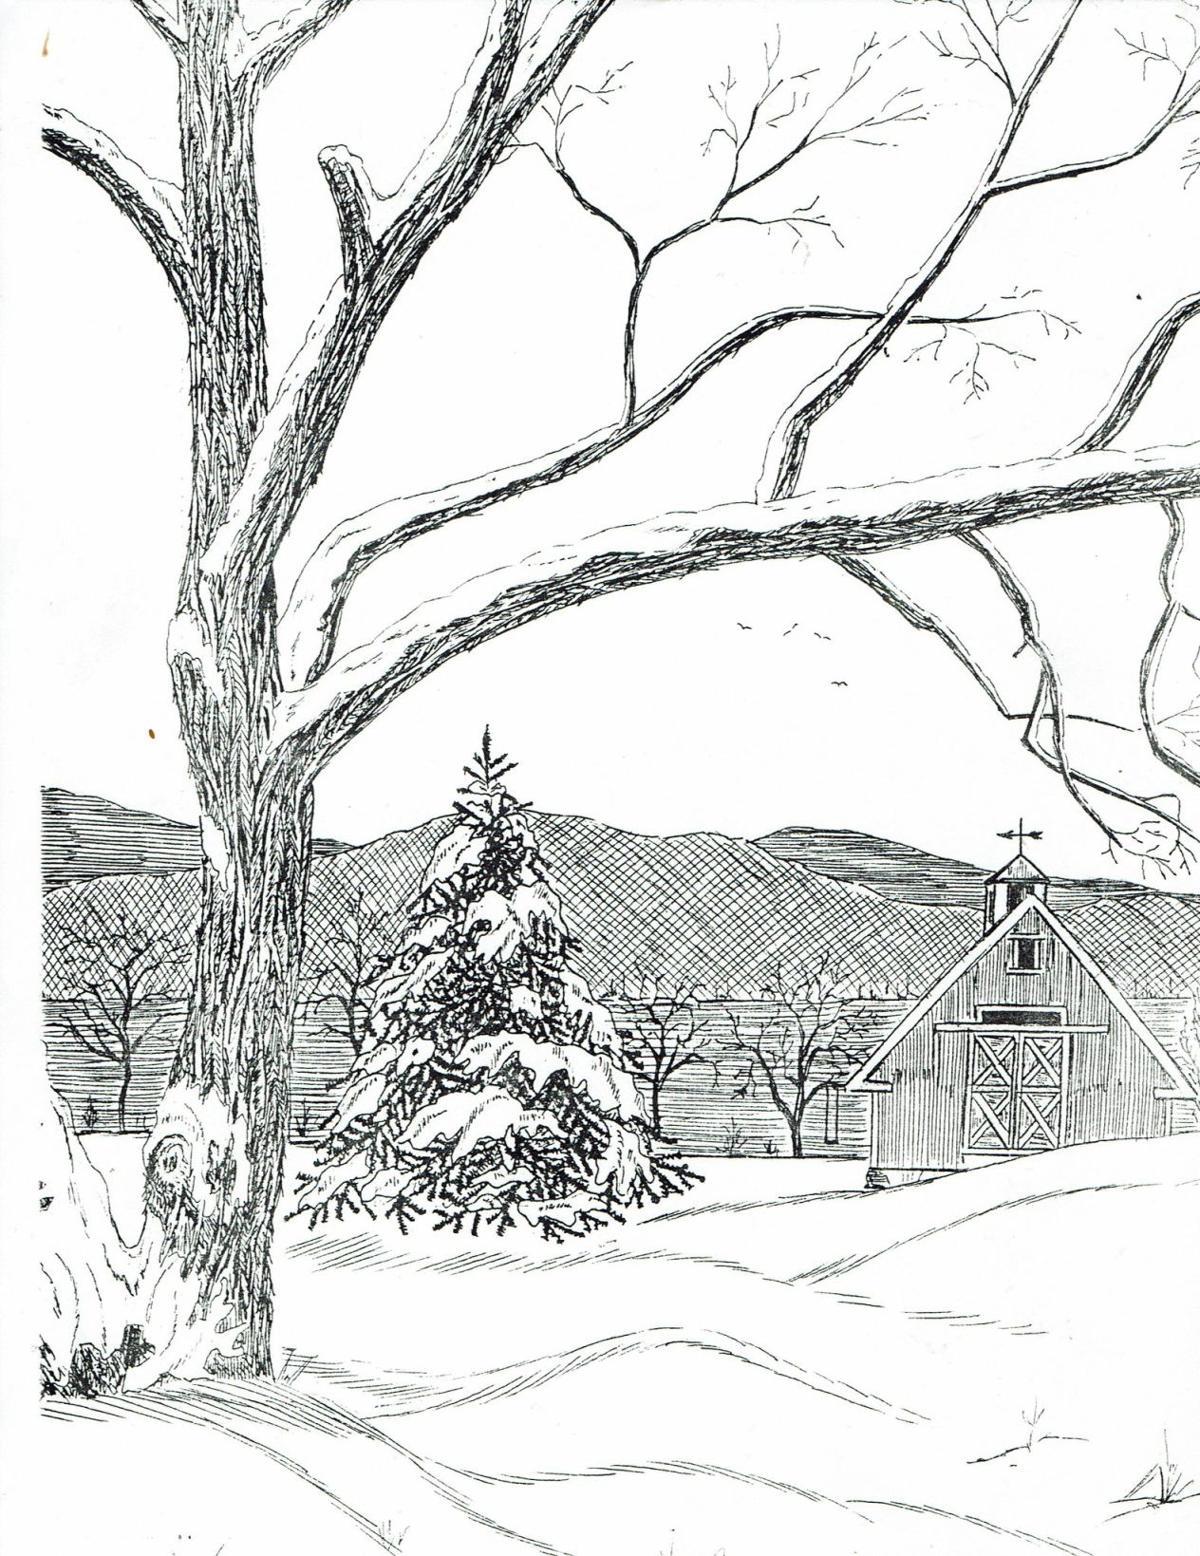 skip sedore - winter scene